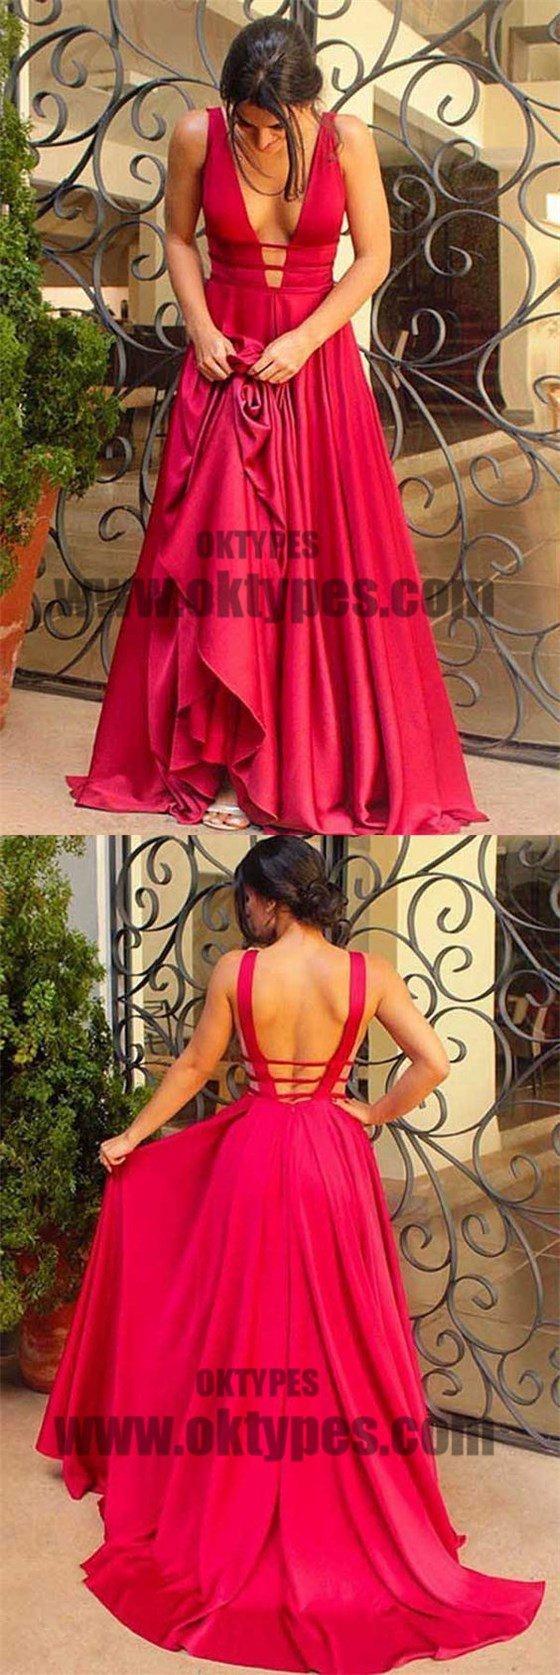 Red spaghetti strap vneck backless prom dresses long mermaid soft